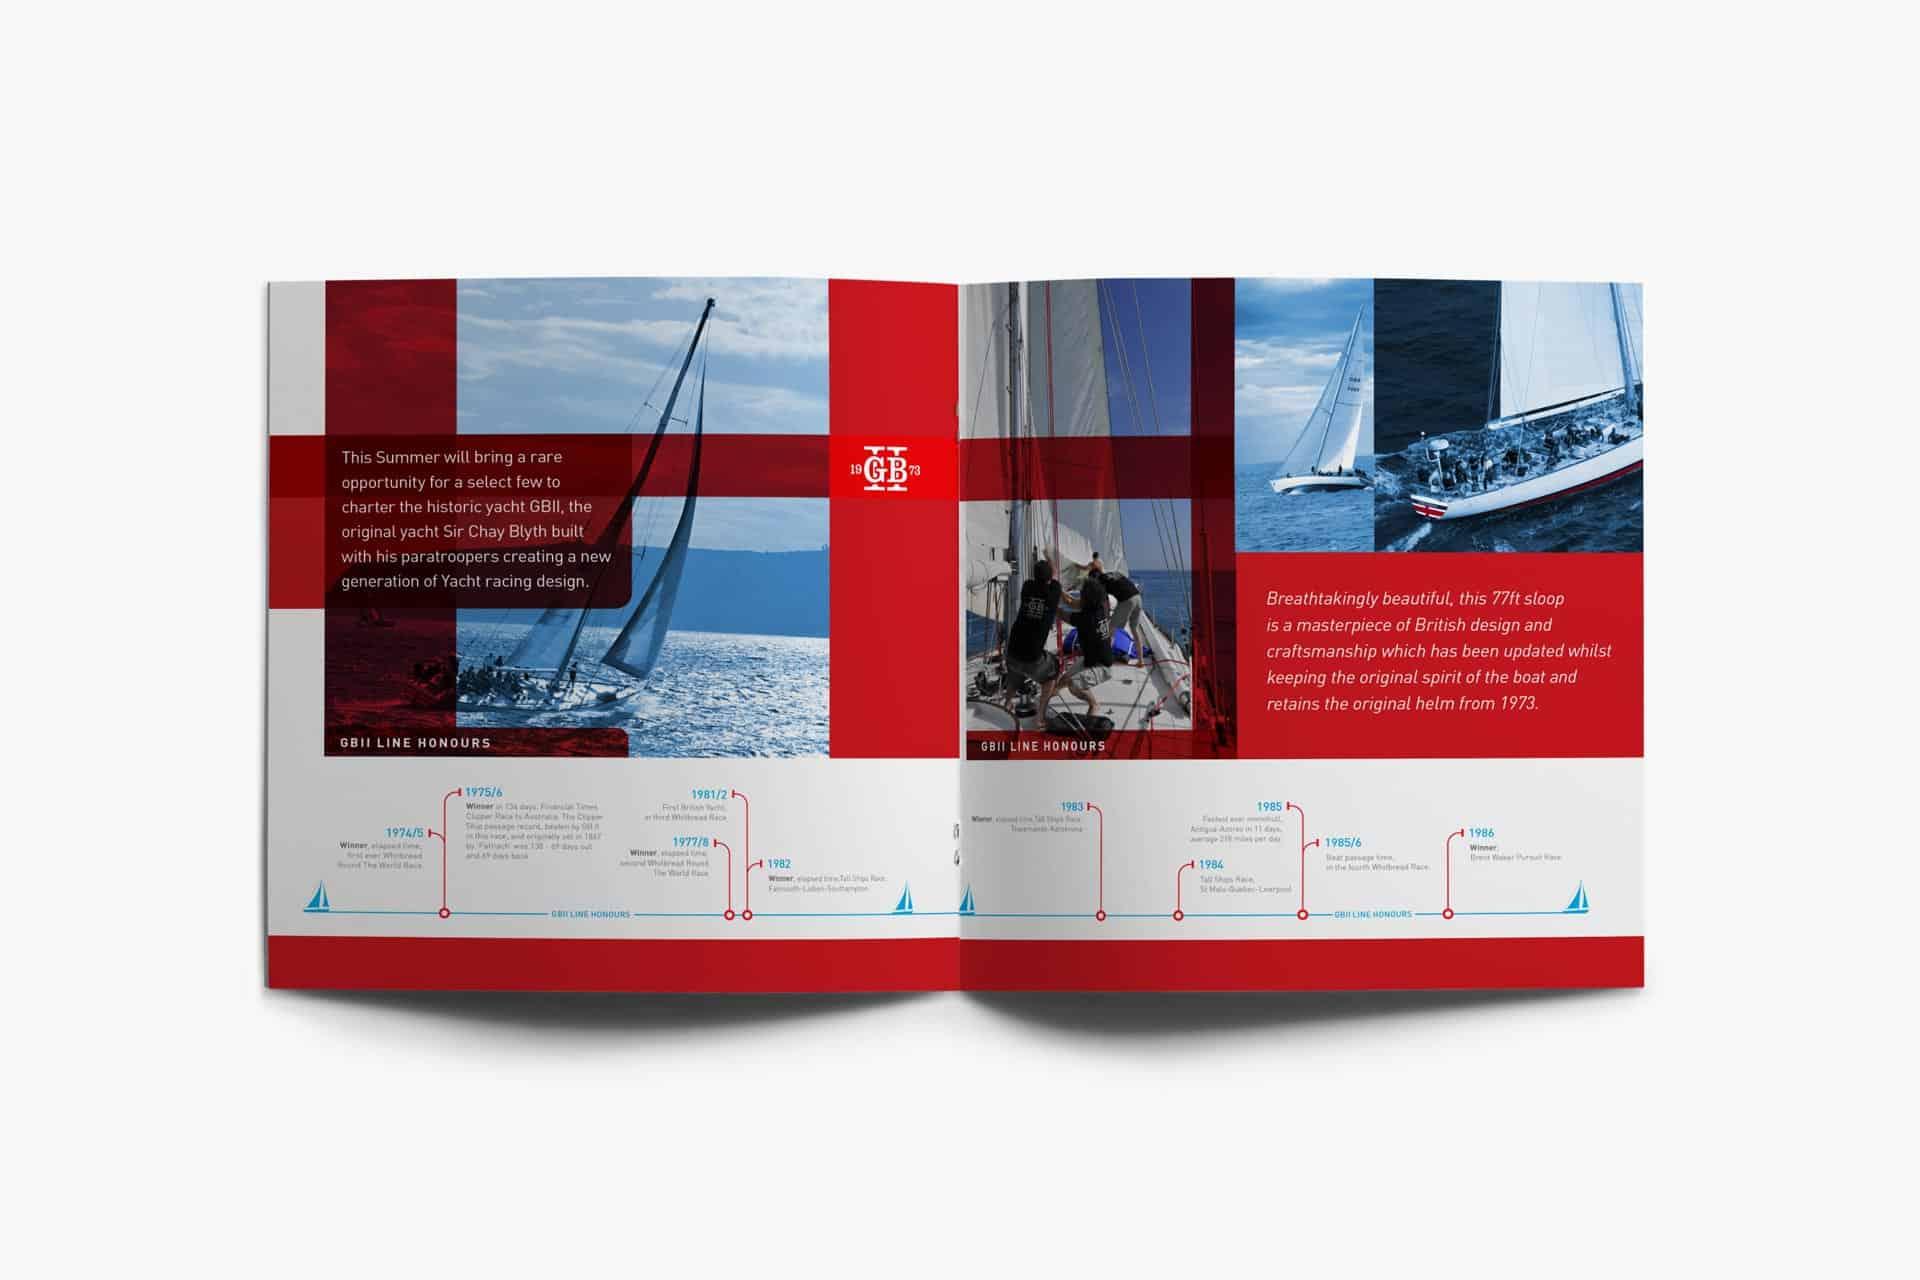 GBII-Brochure-design-infographic